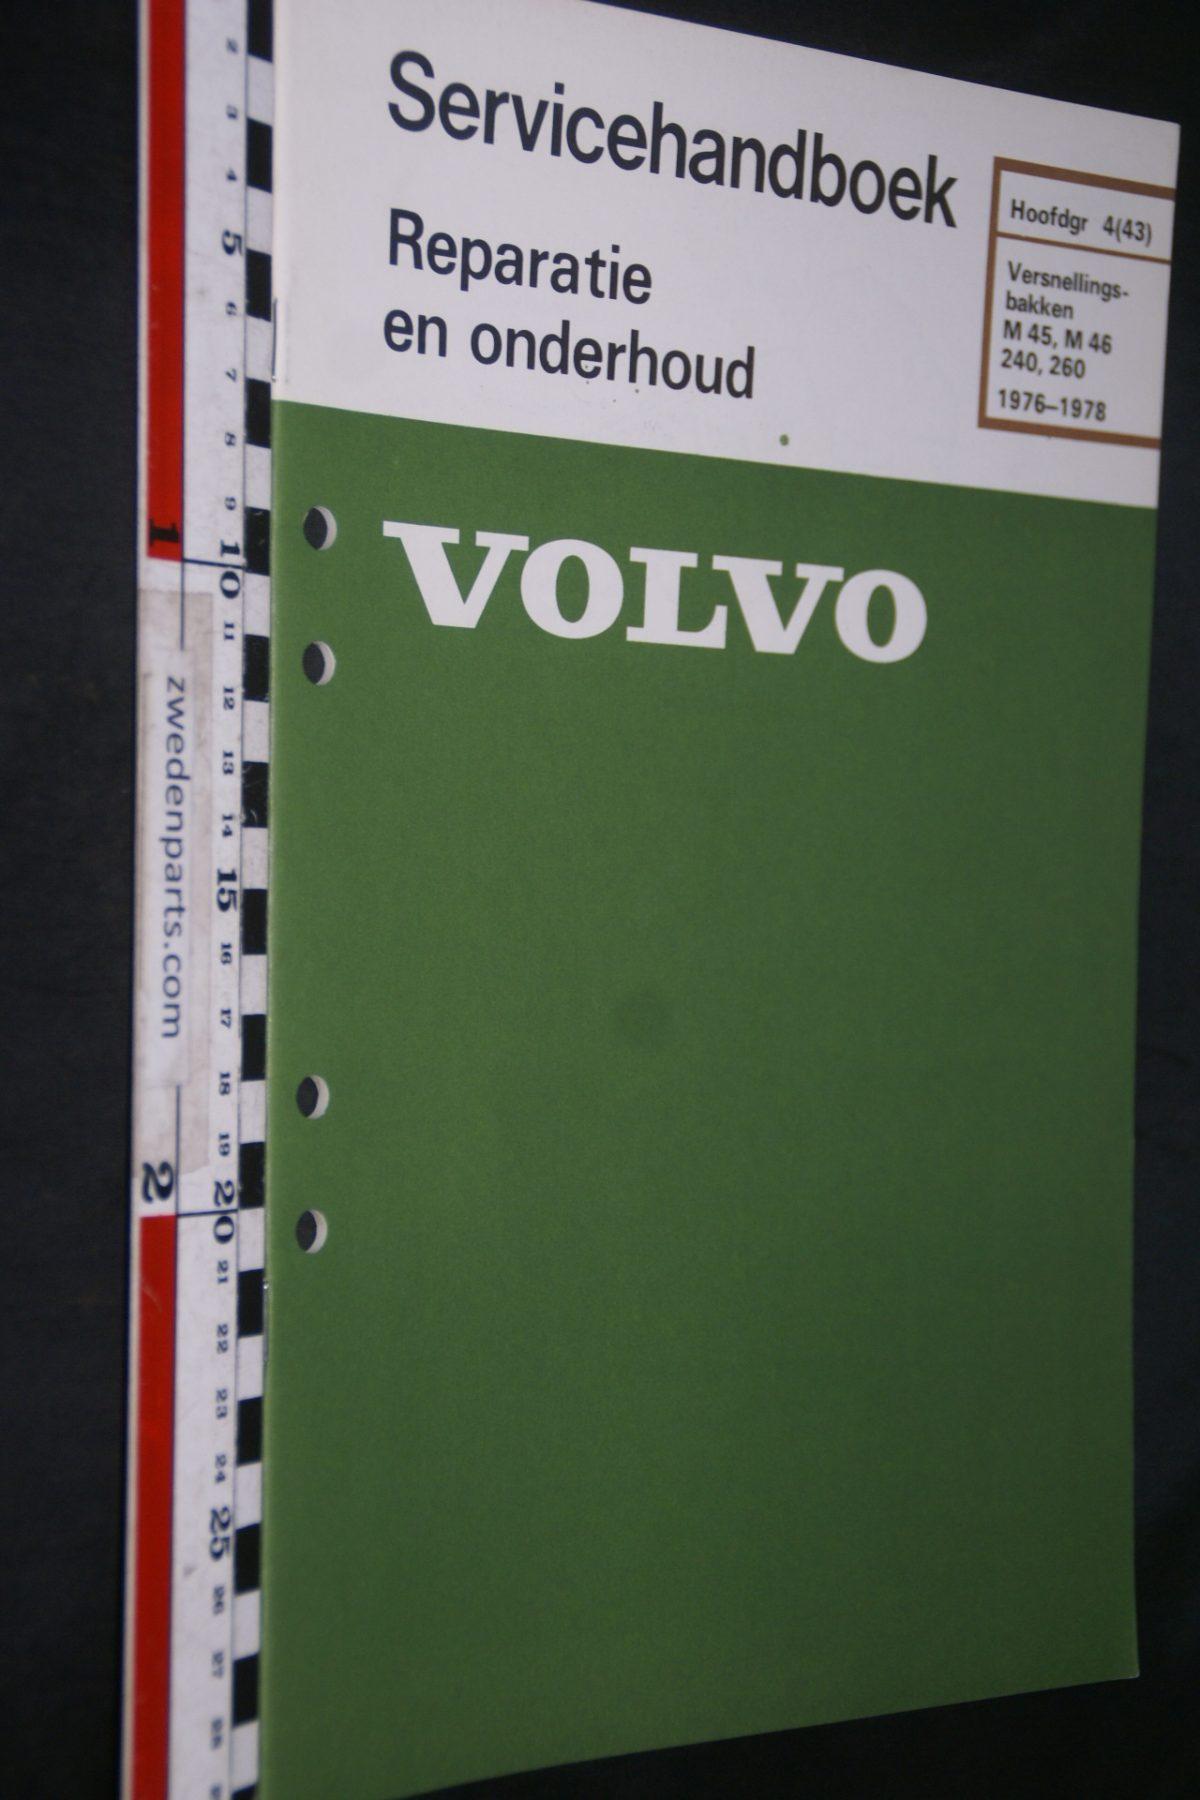 DSC06744 1981 origineel Volvo 240, 260 servicehandboek 4 (43) versnellingsbak M45, M46 1 van 800 TP 11159-2